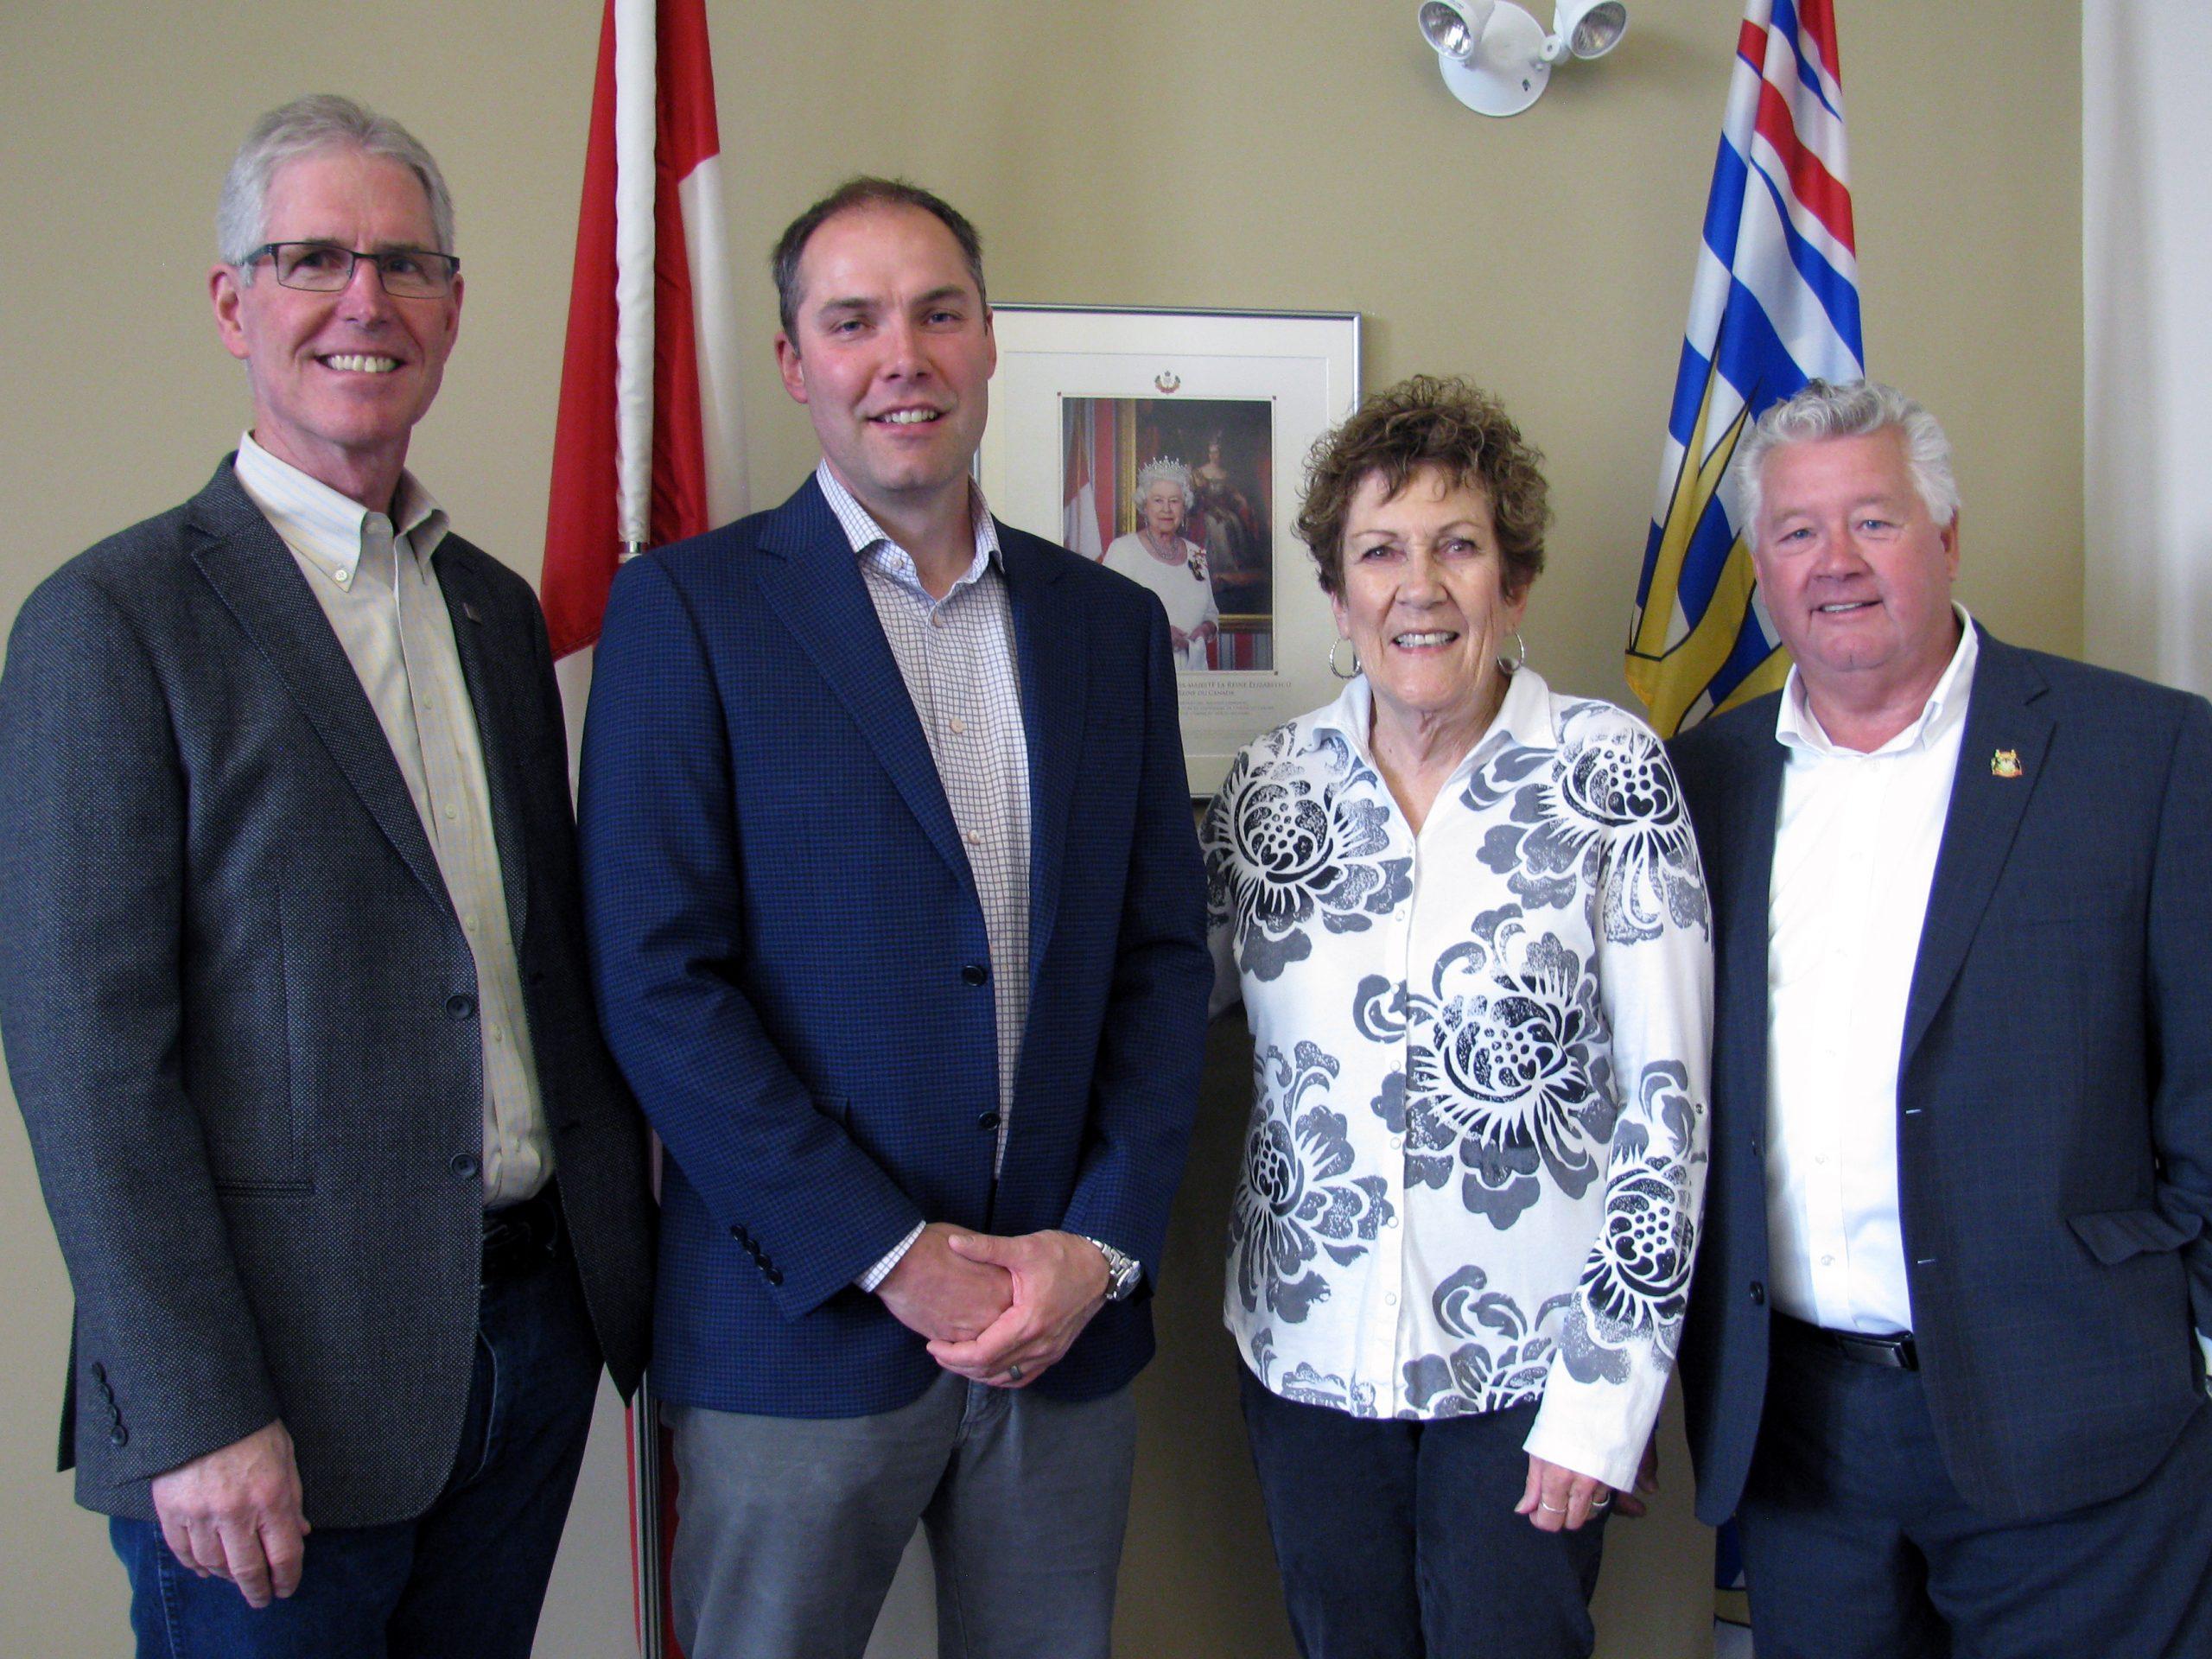 2018 Kimberley-Cranbrook 55+ BC Games Presidents announced